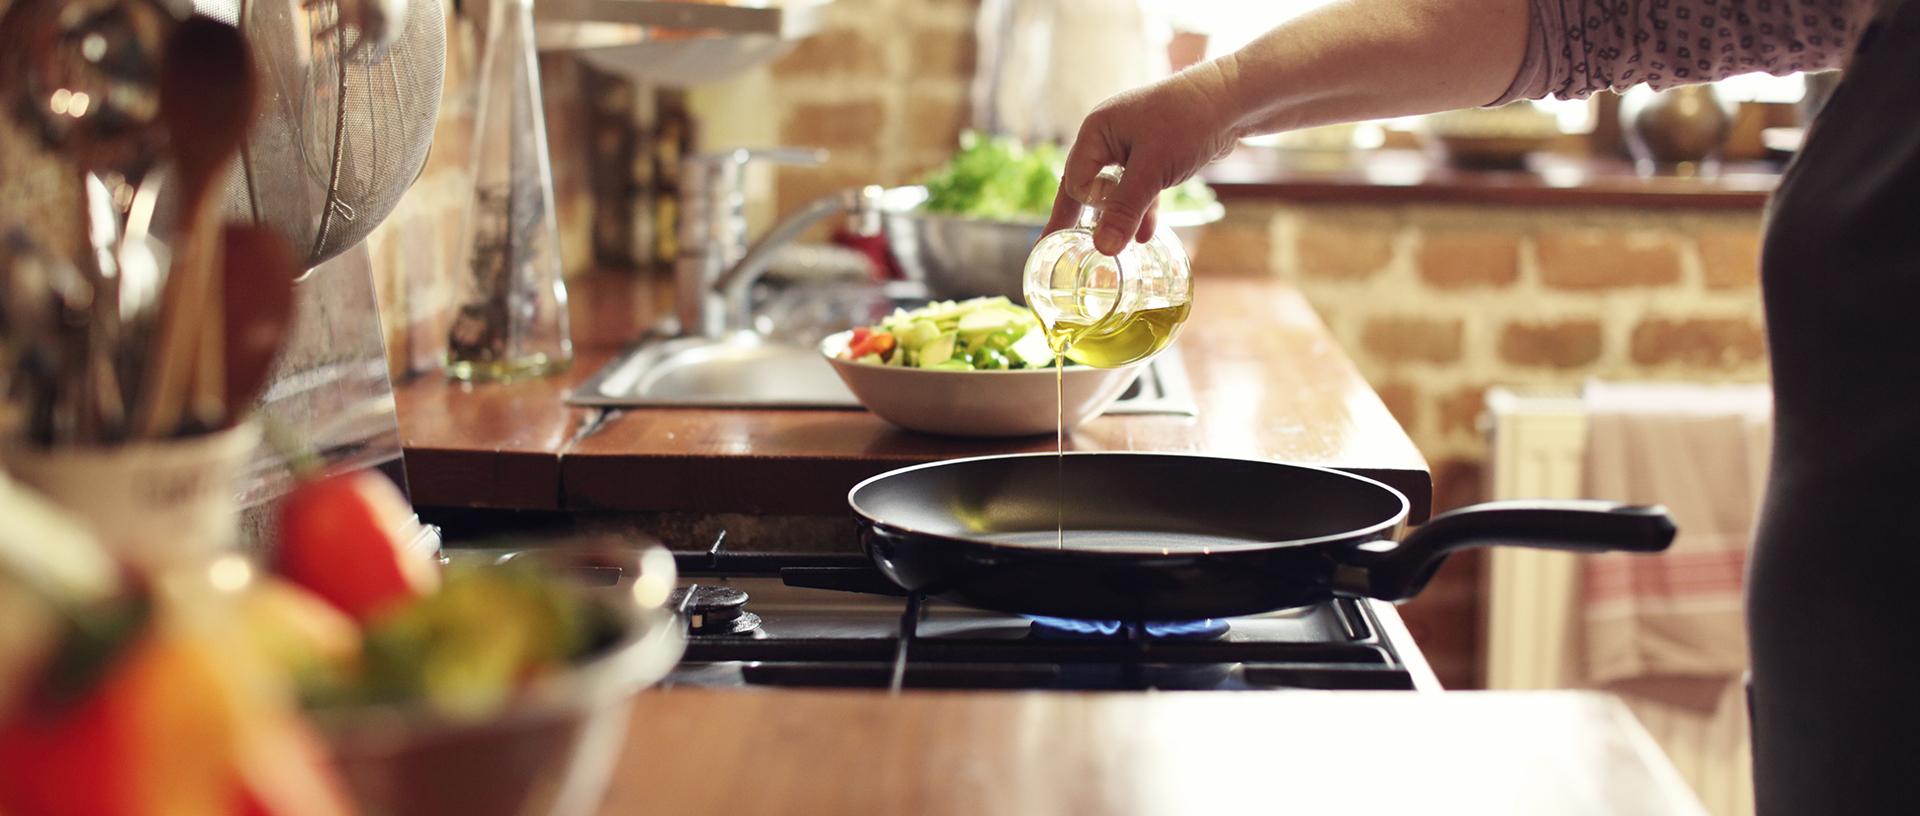 Cuisine au gaz : cuisine plaisir !